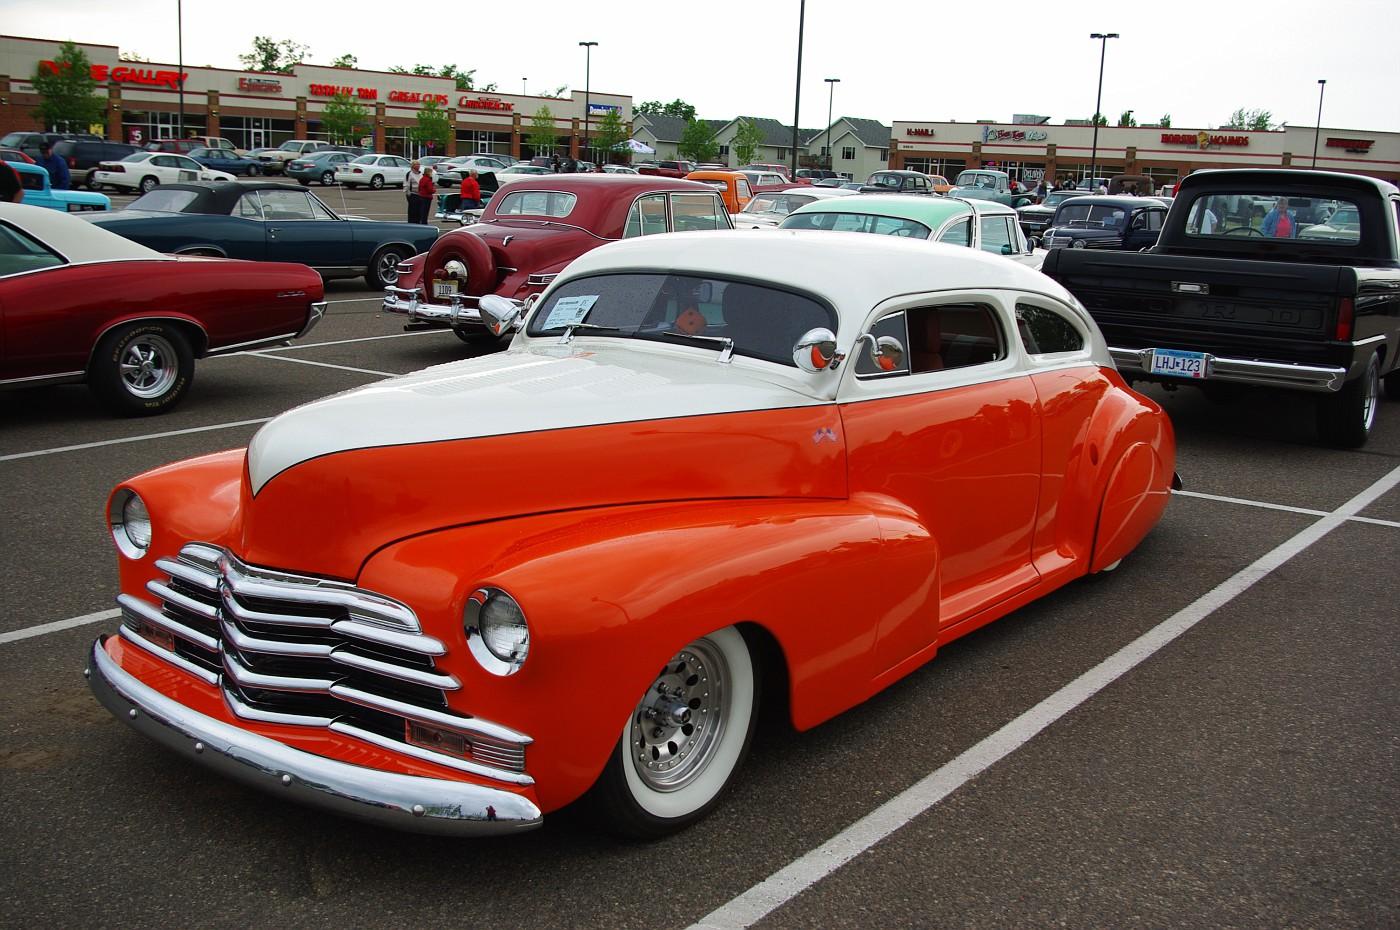 St Francis car show 5-29-09 015